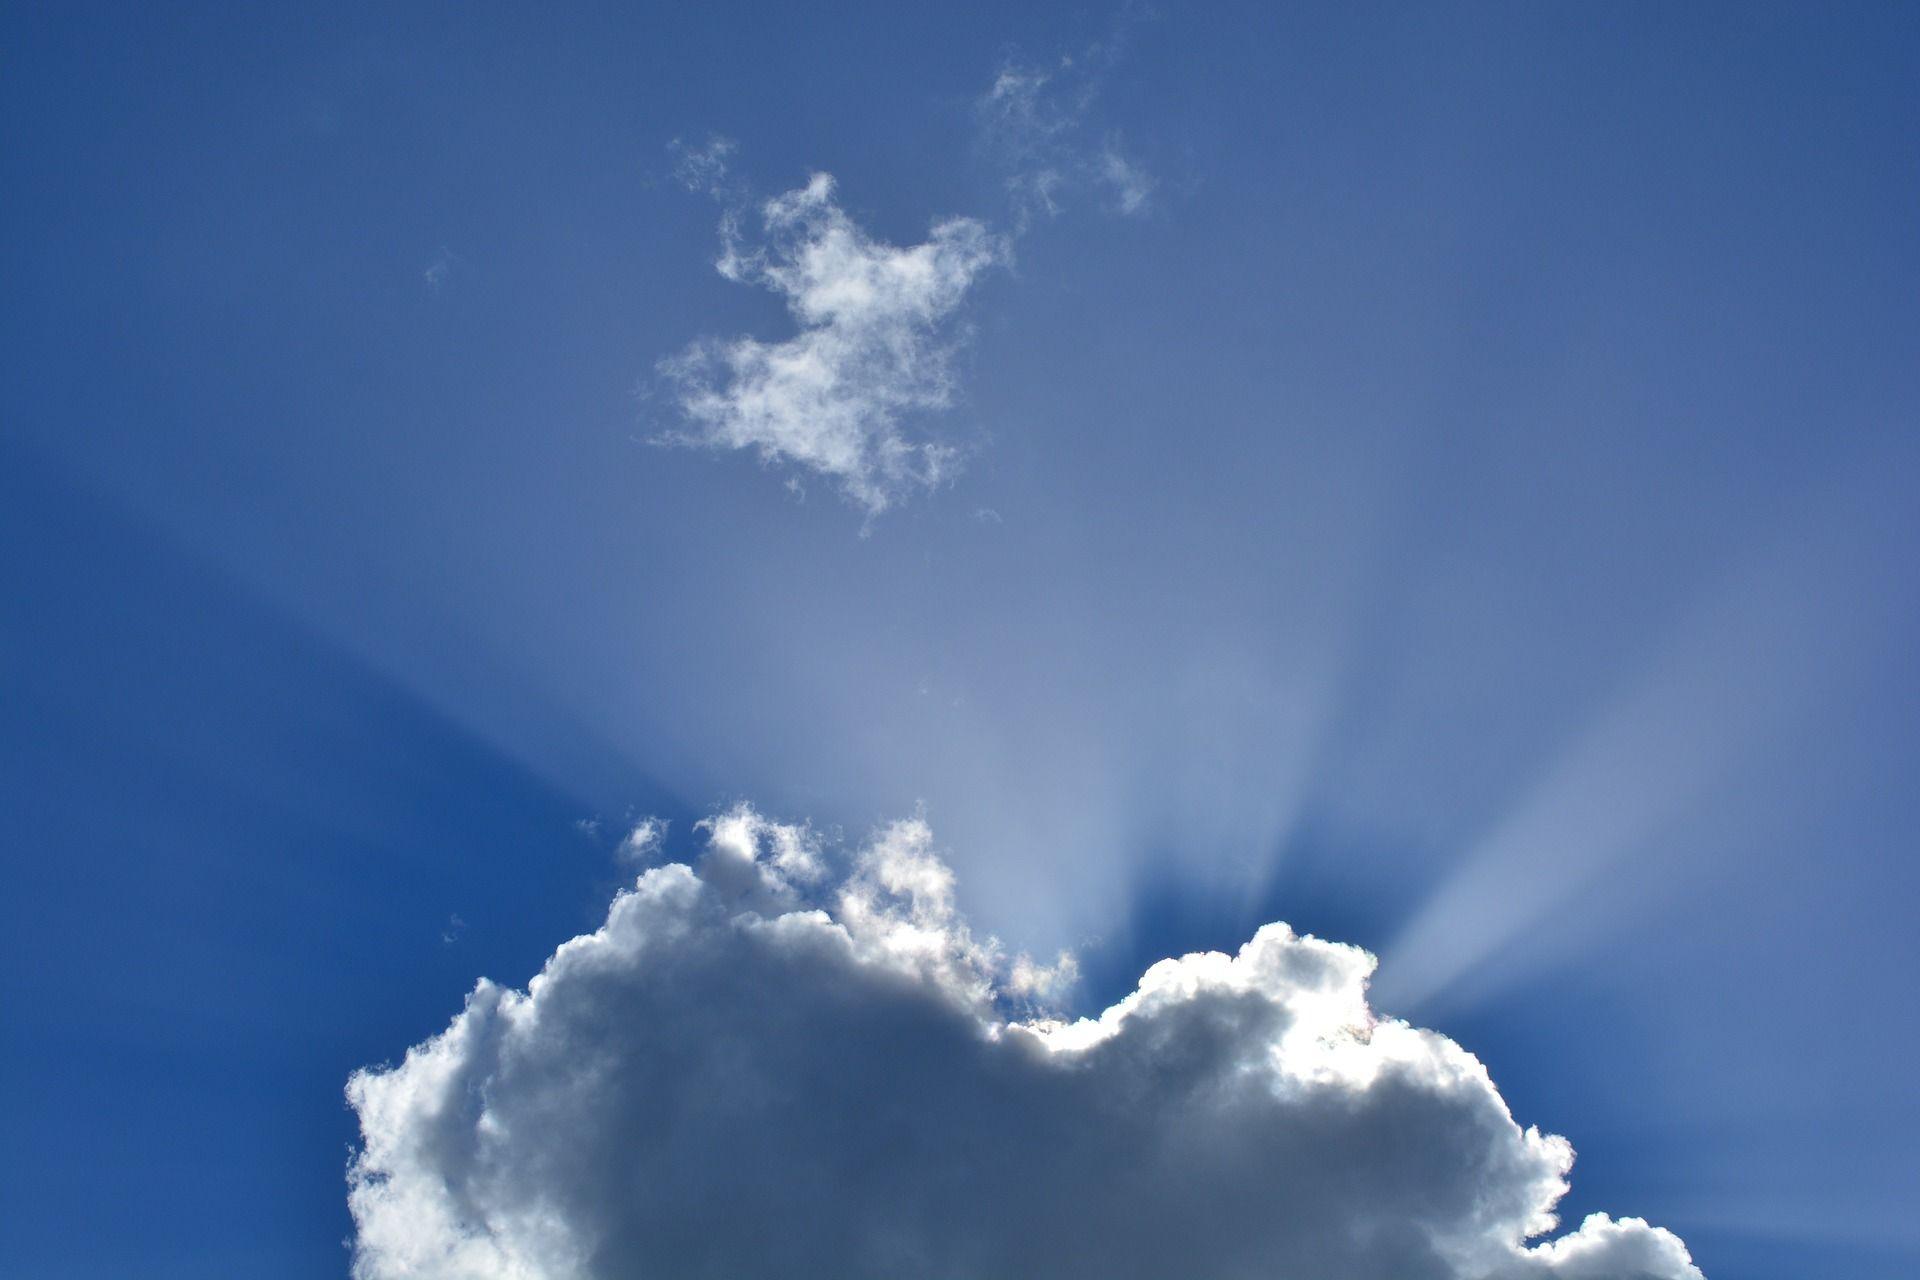 clouds-295695_1920.jpg